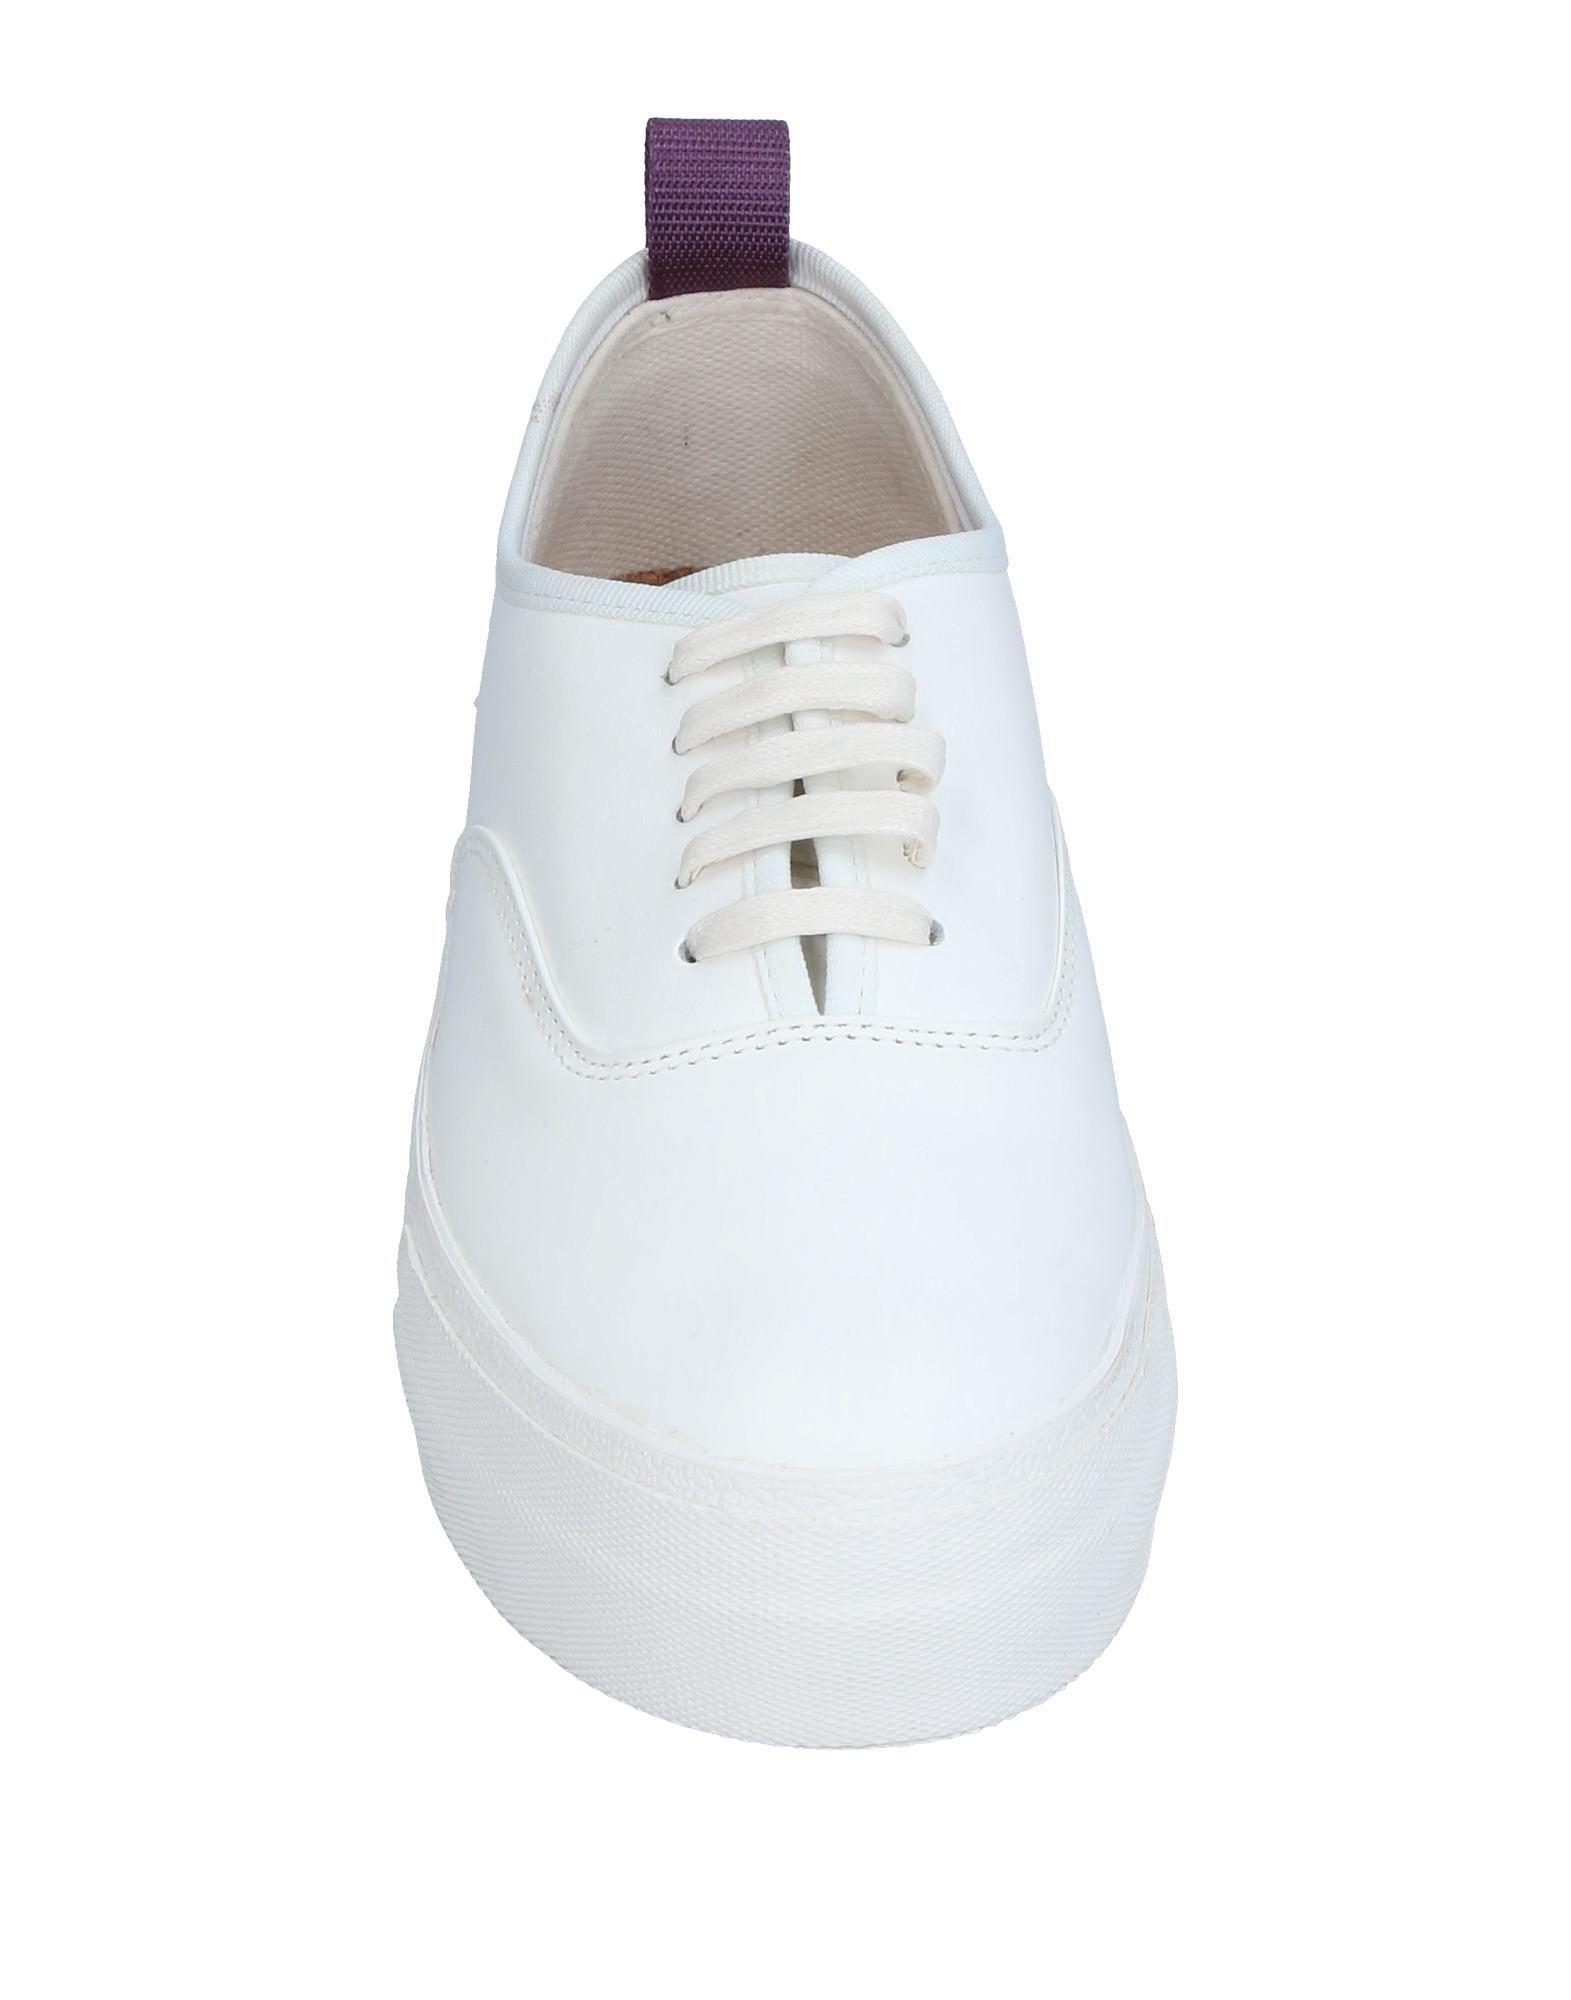 Eytys Eytys Eytys Sneakers Damen  11250660TA Gute Qualität beliebte Schuhe f73a7c